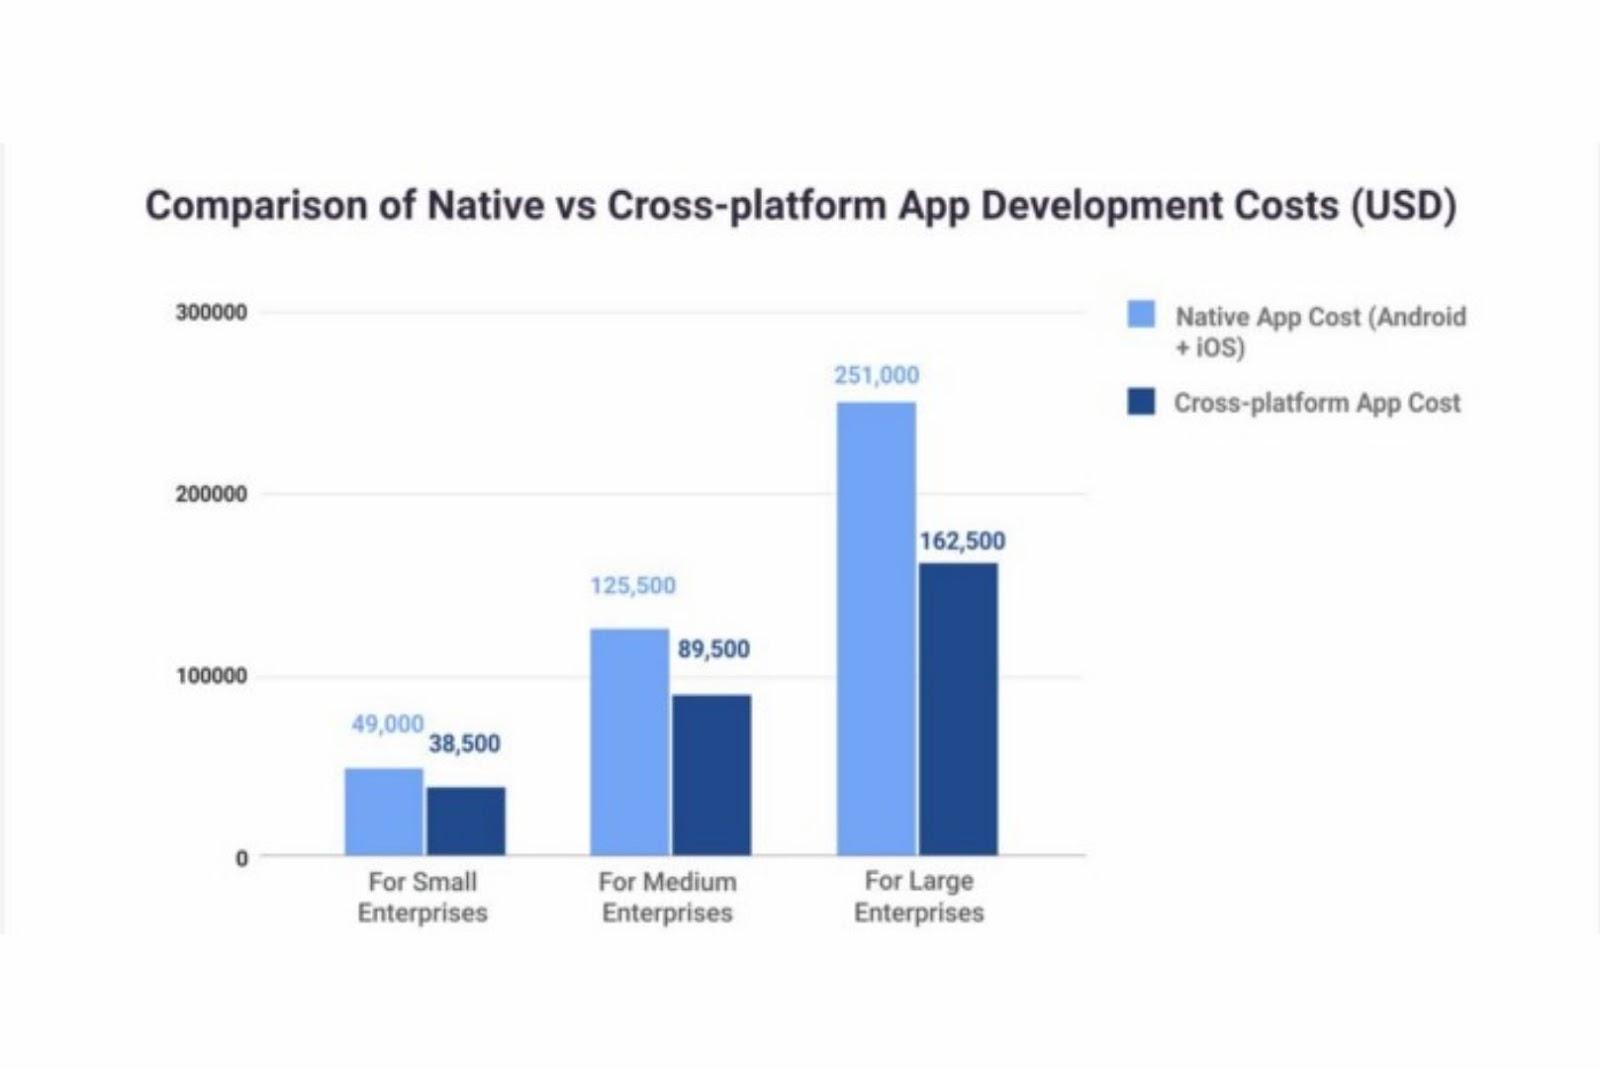 Comparison of native vs cross-platform app development costs